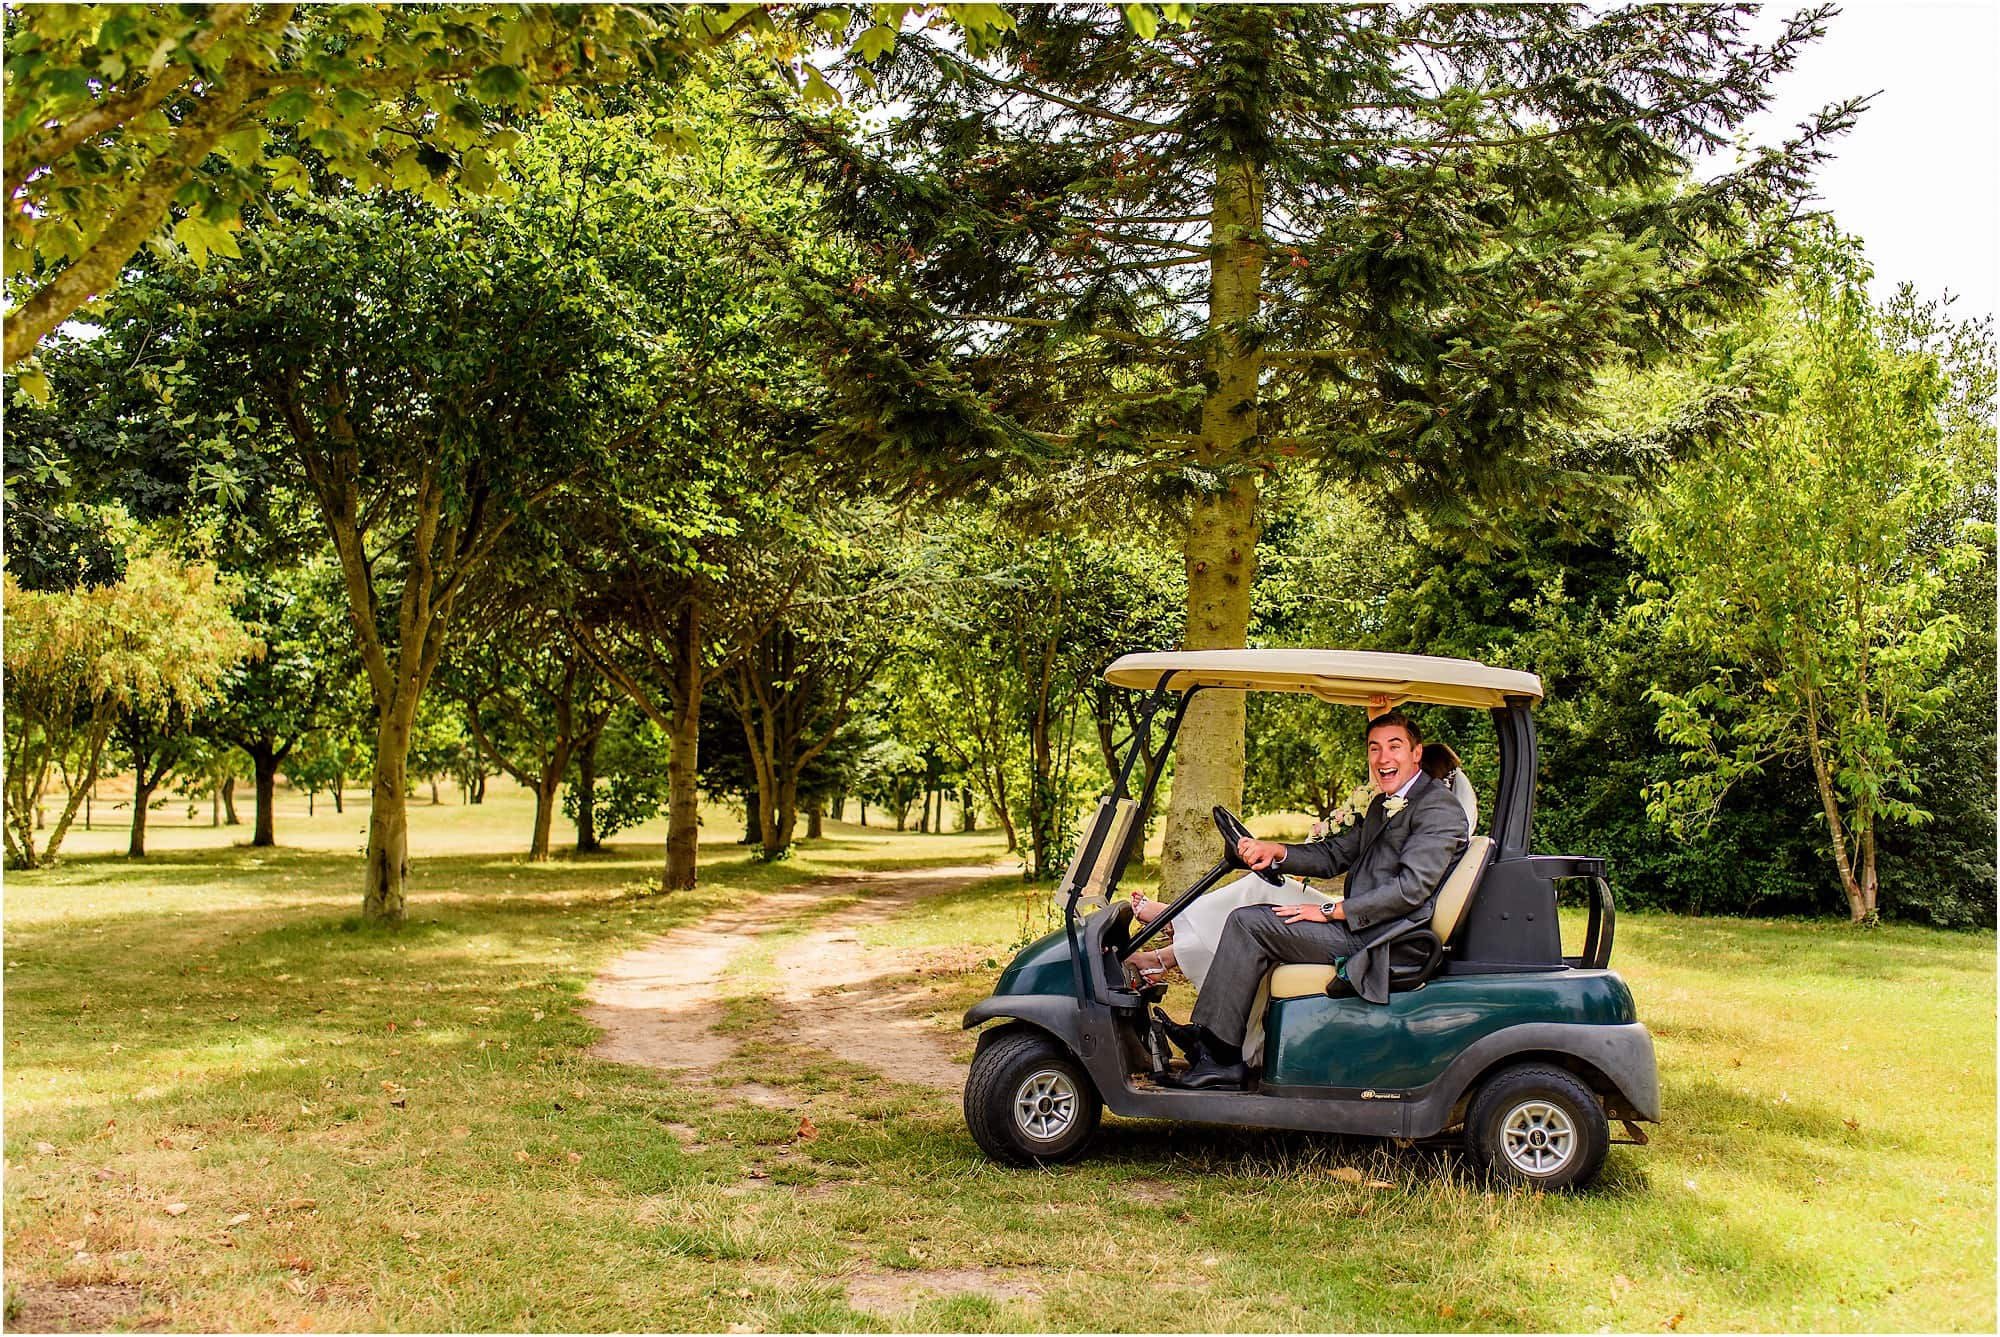 Dunston Hall Norfolk golf buggy